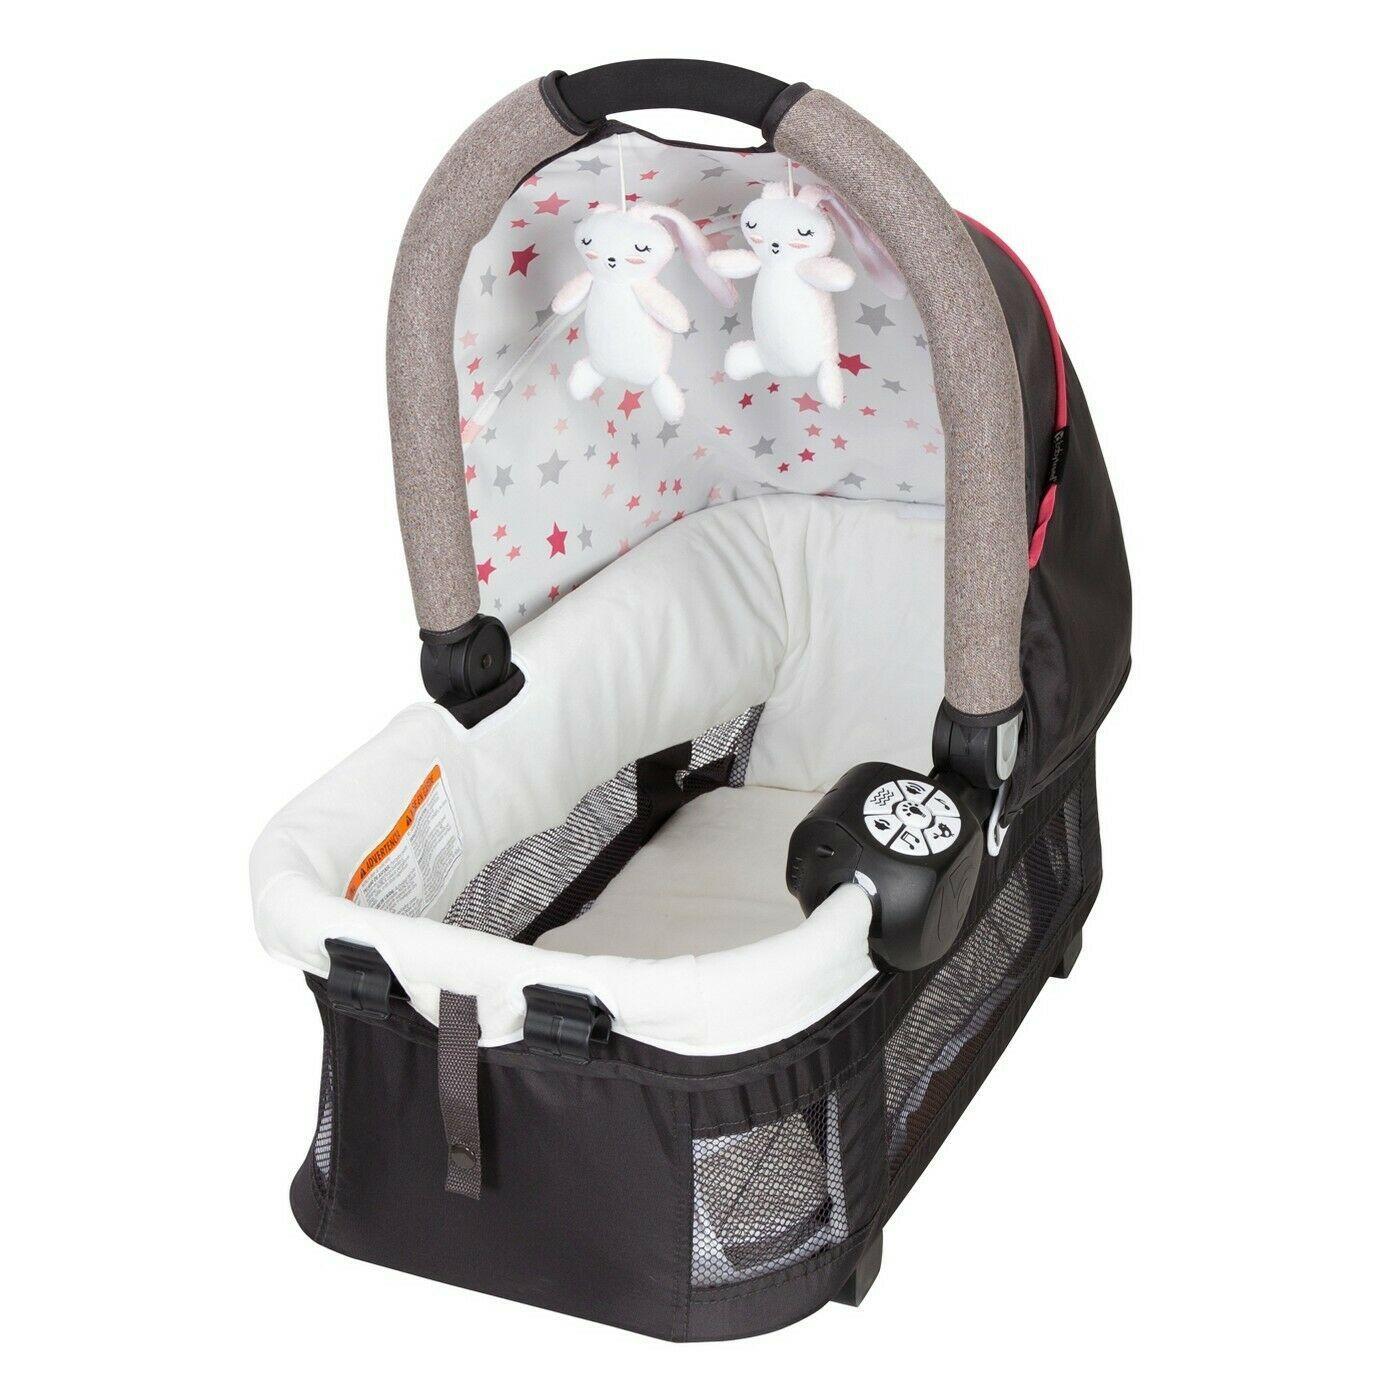 Babytrend golite elx nursey center (stardust rose)